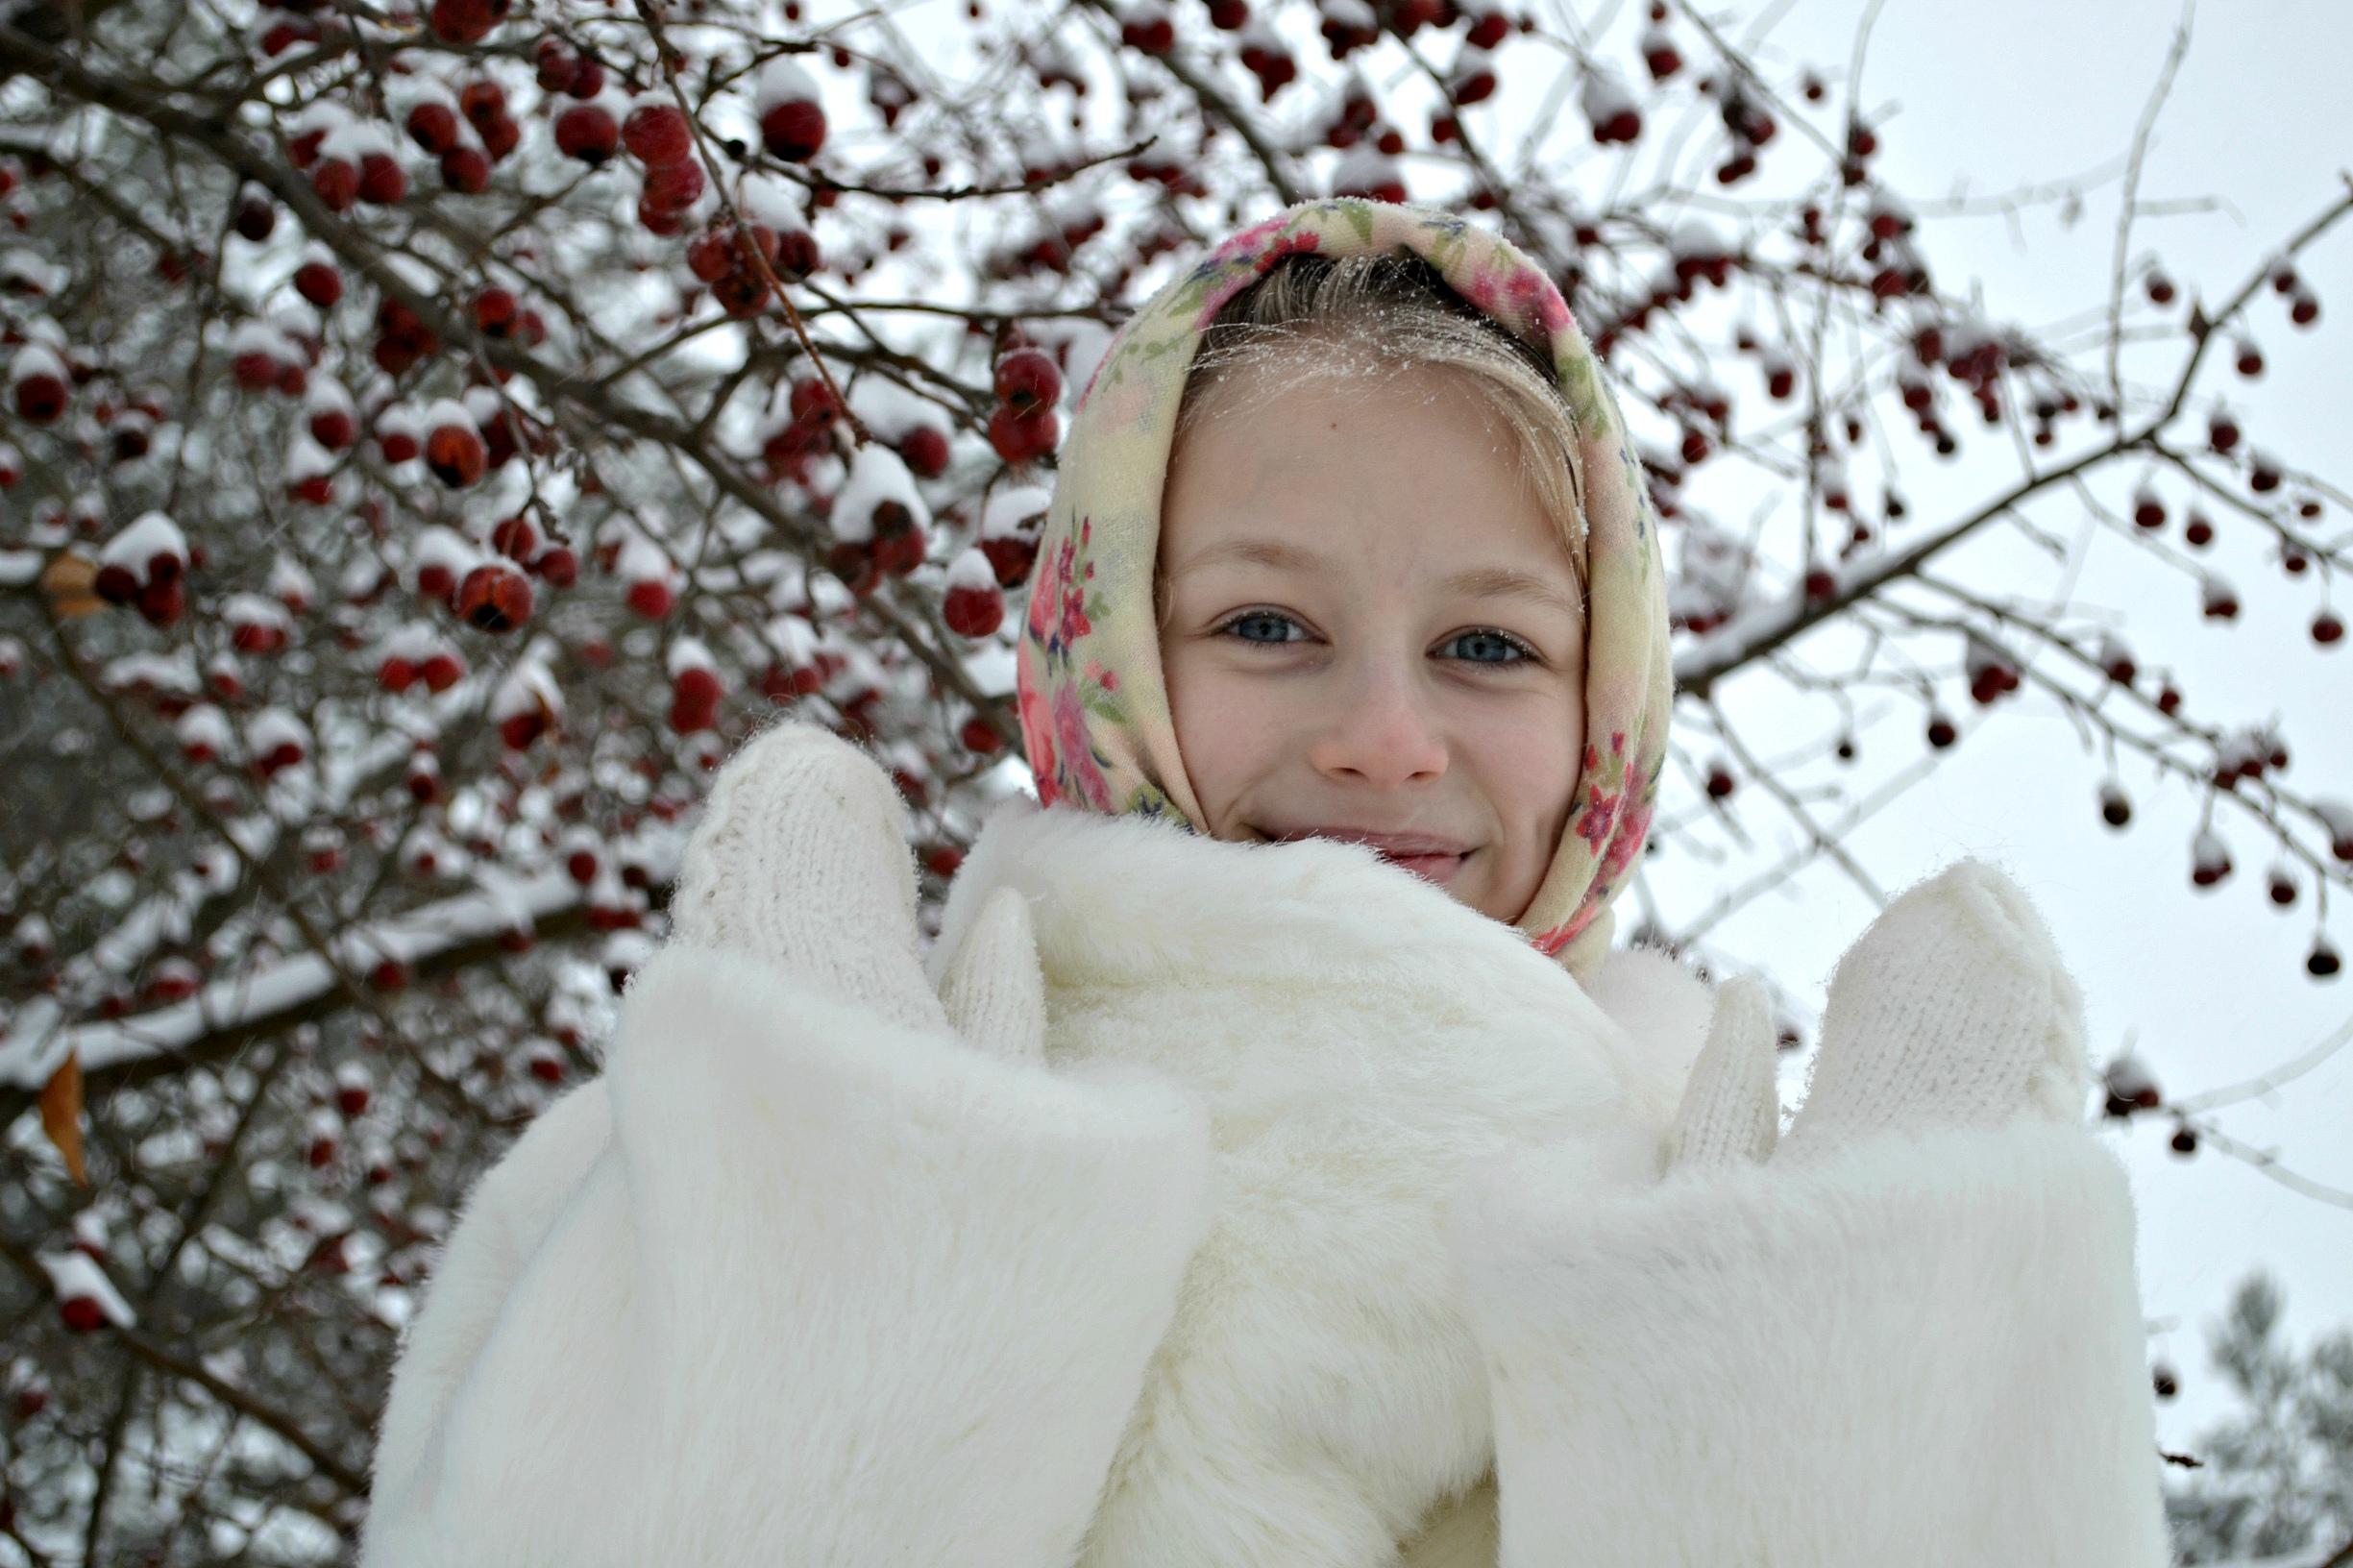 Зимние забавы!. Зимние забавы